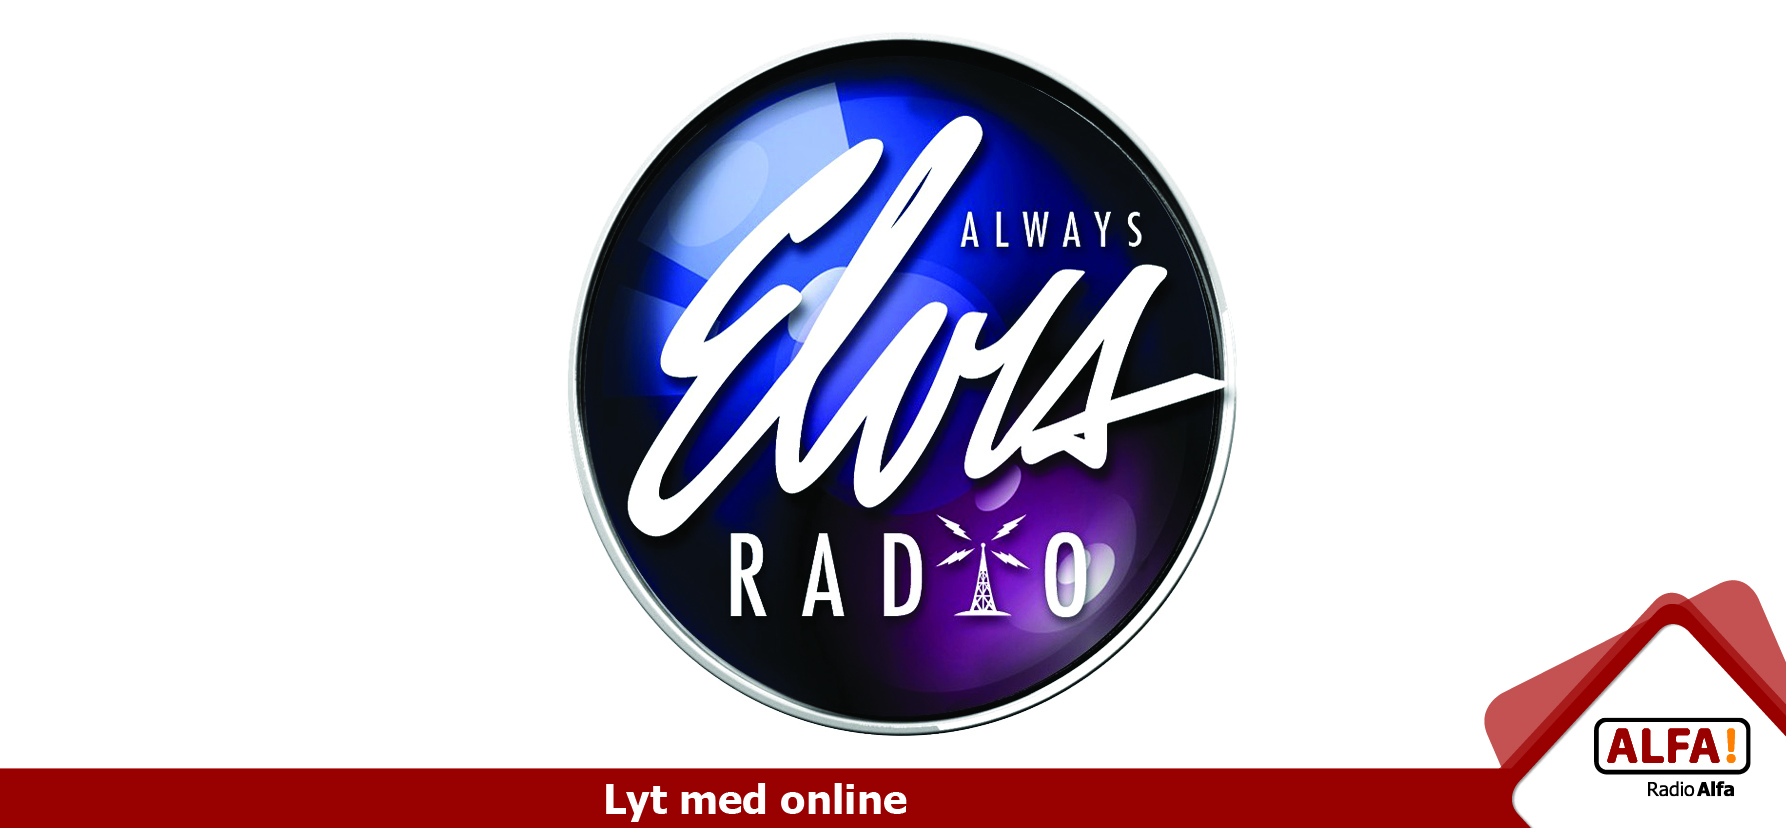 AlwaysElvisRadioOnlineBanner630x292